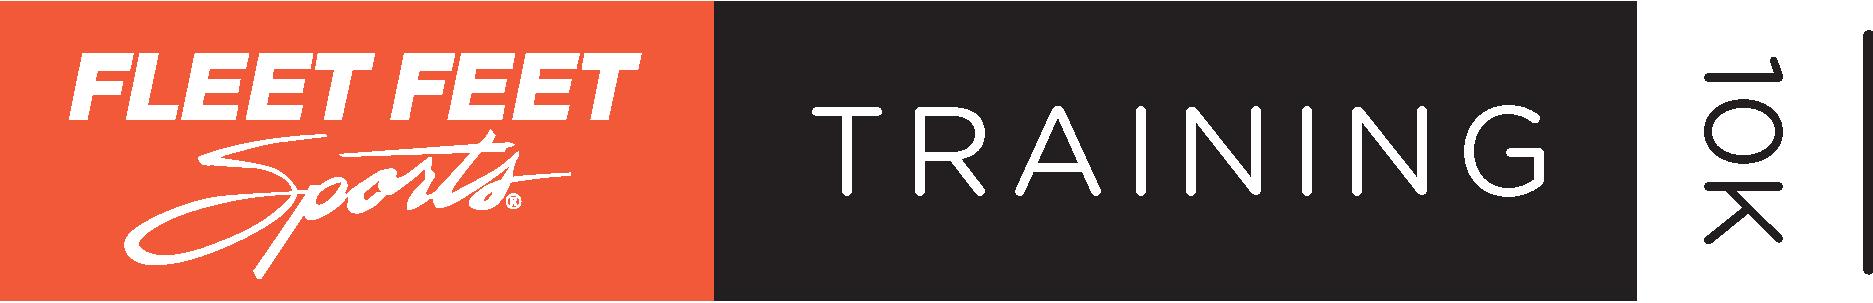 10K Training logo